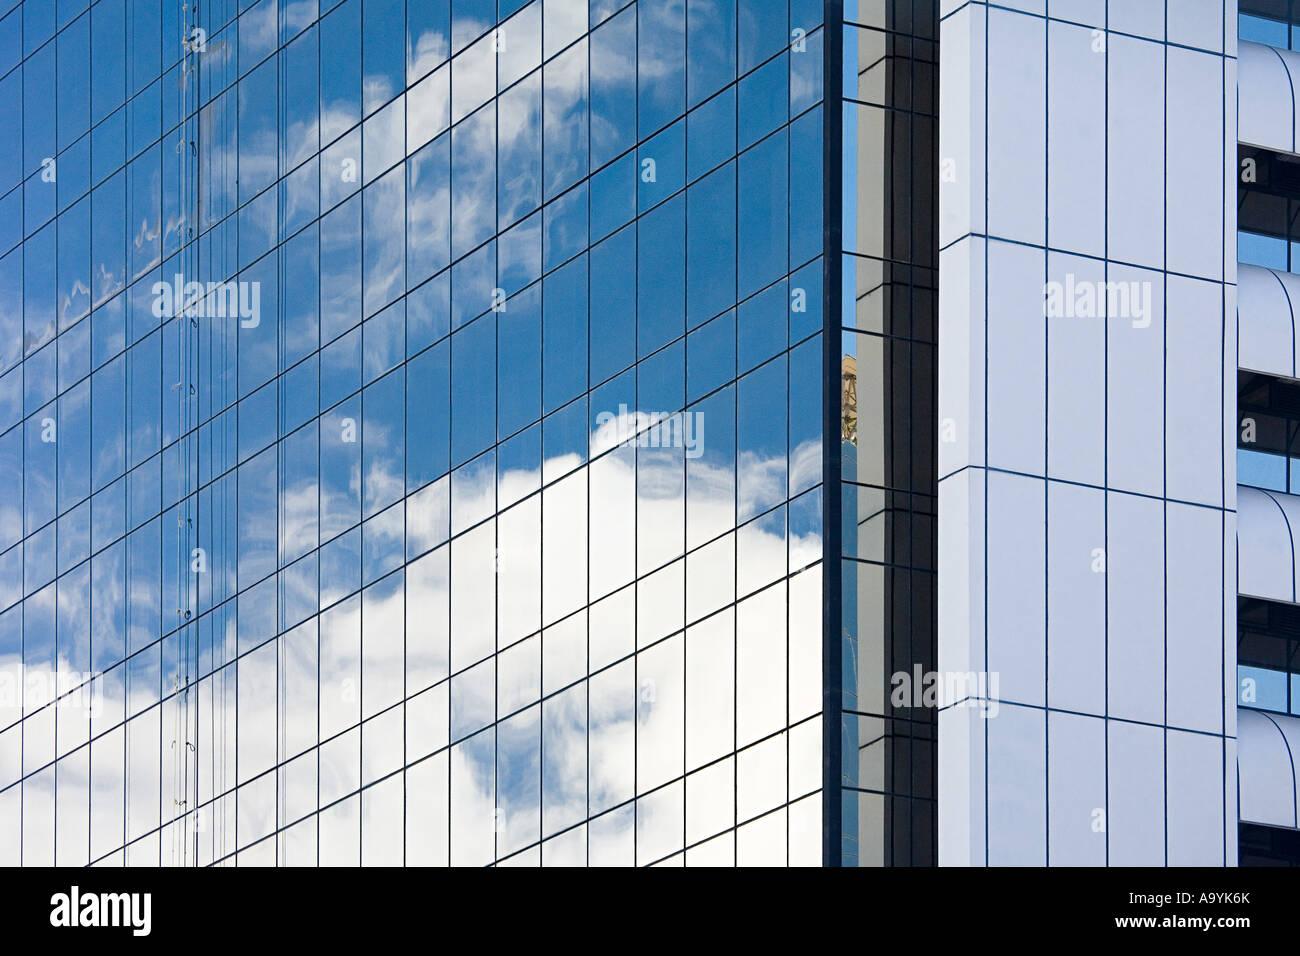 Multistorey building - Stock Image